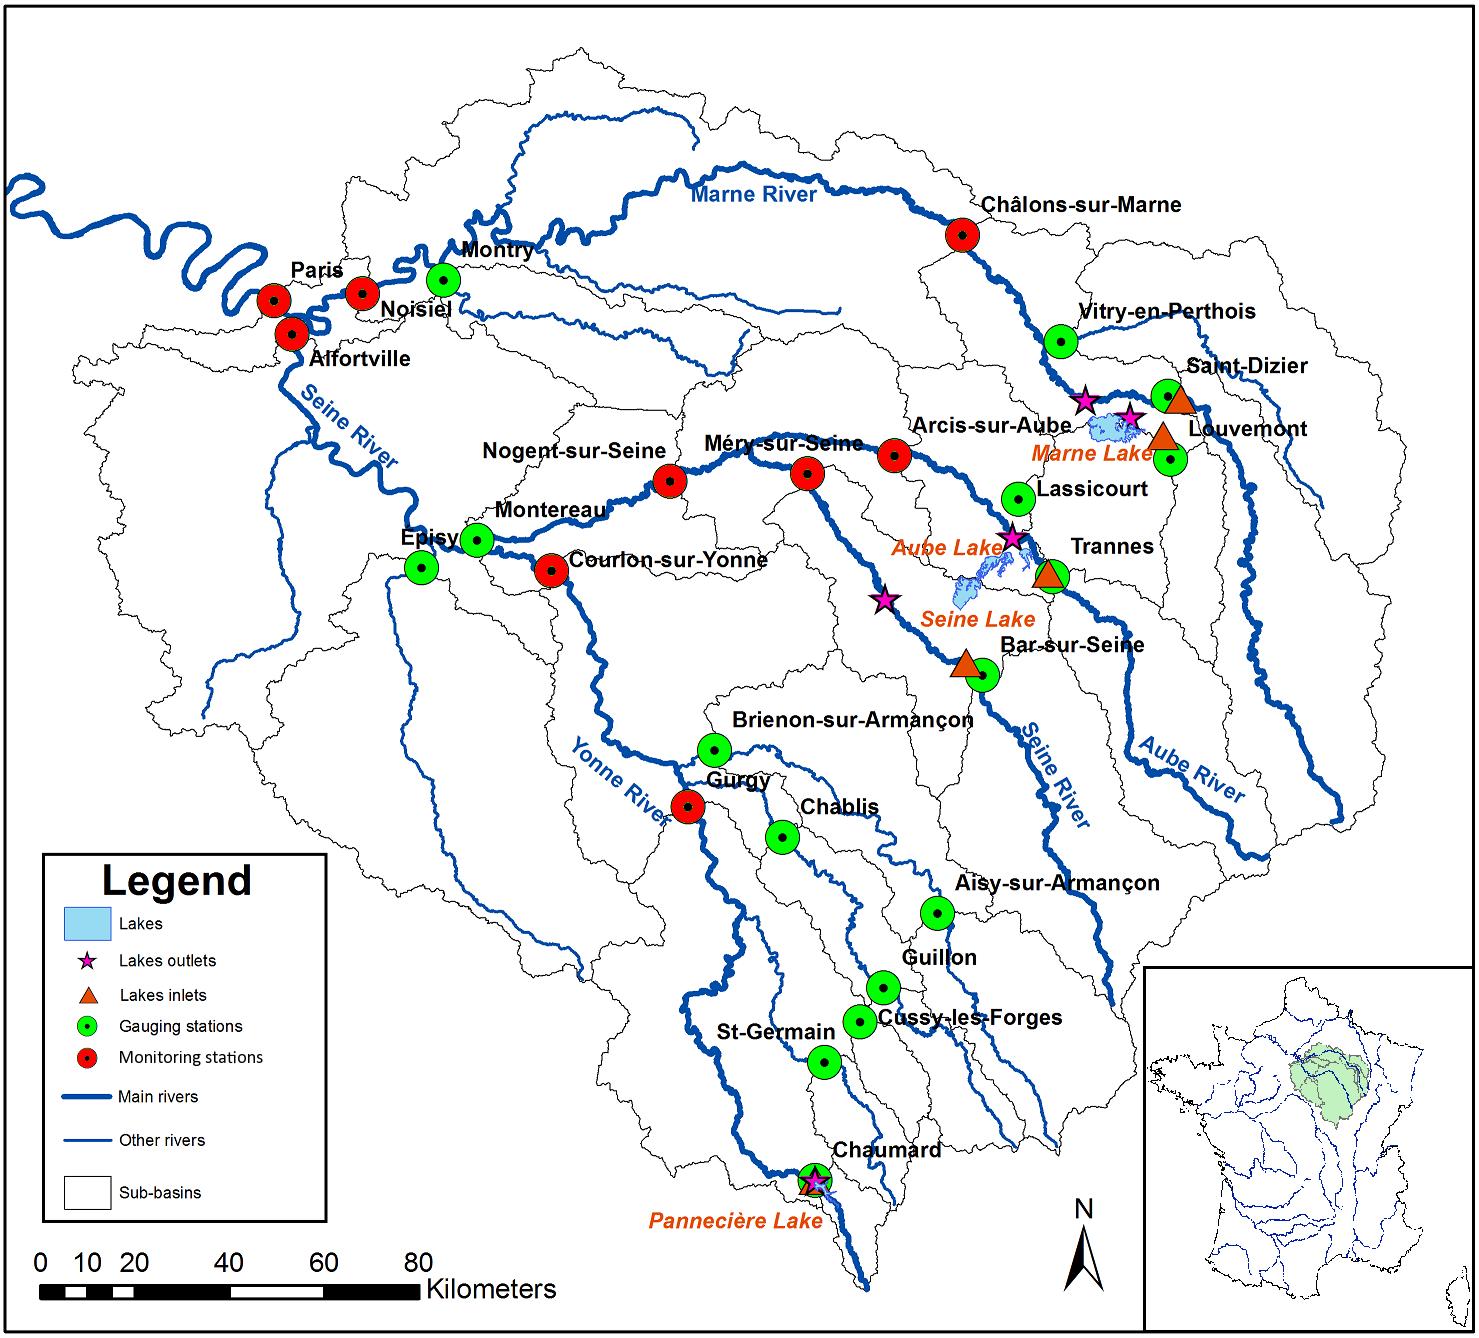 inst/app/www/documentation/map_seine_basin.png